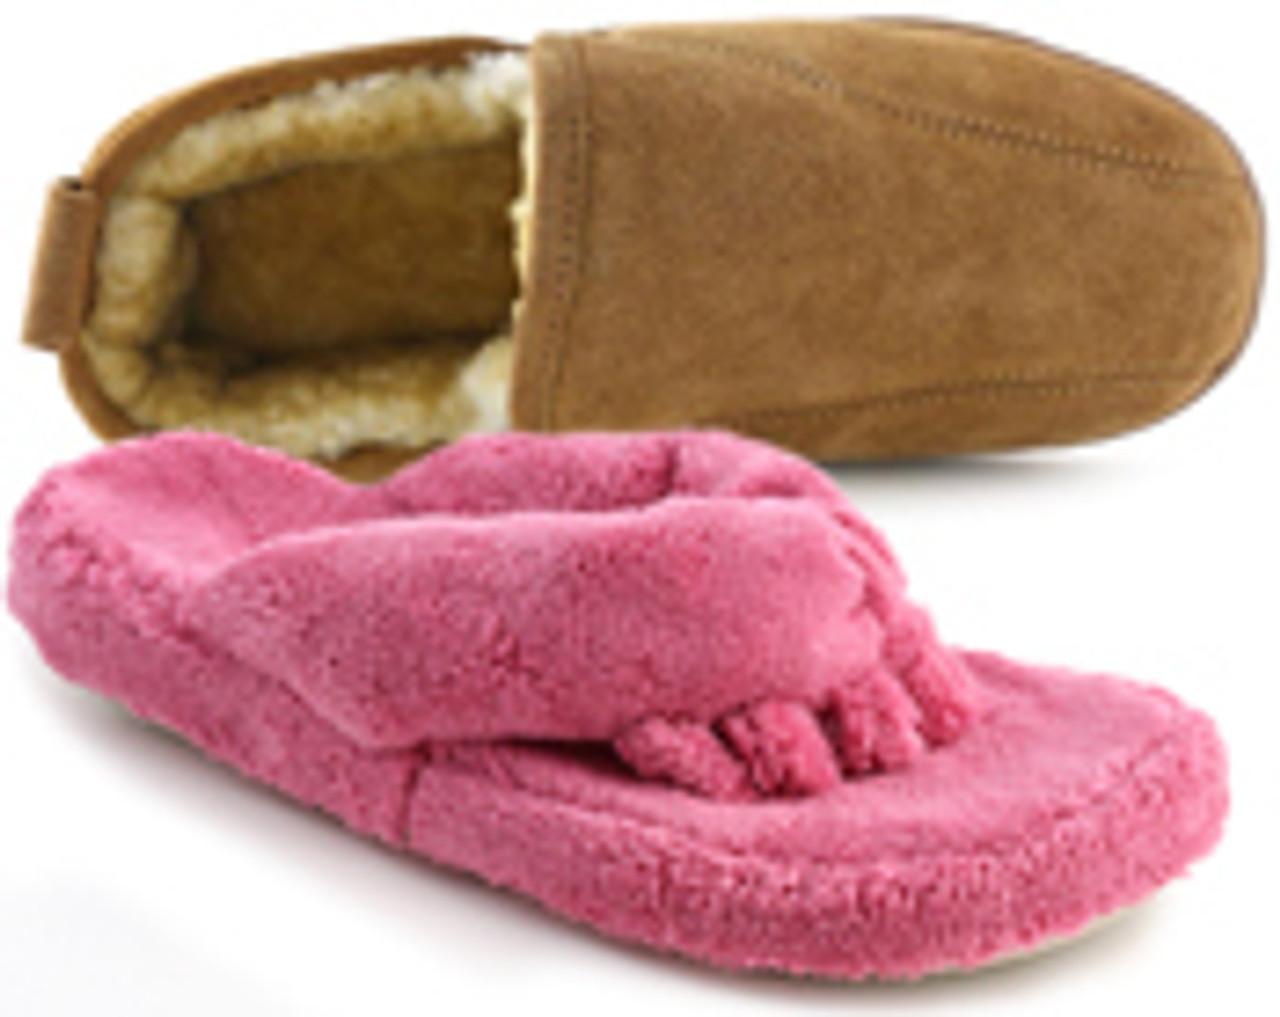 Orthopedic Slippers   Orthopedic House Shoes